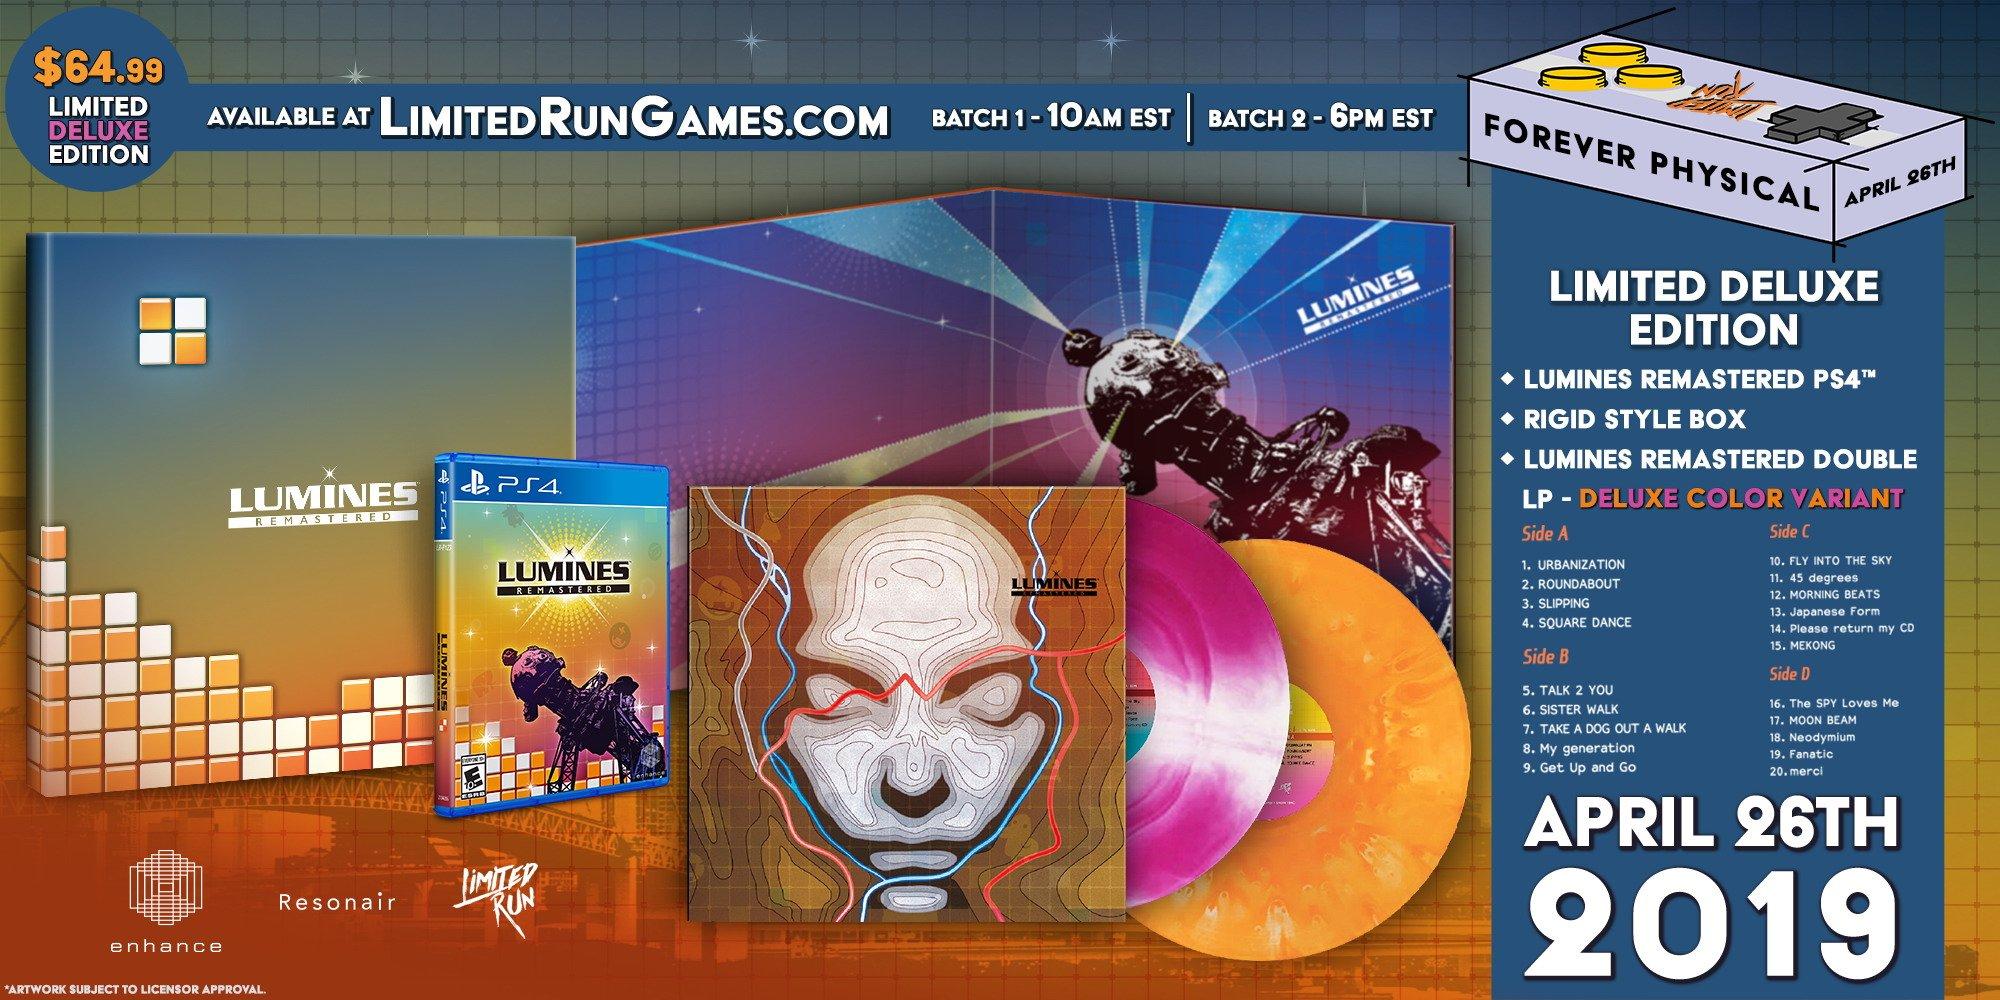 DeluxeEdition Lumines PS4